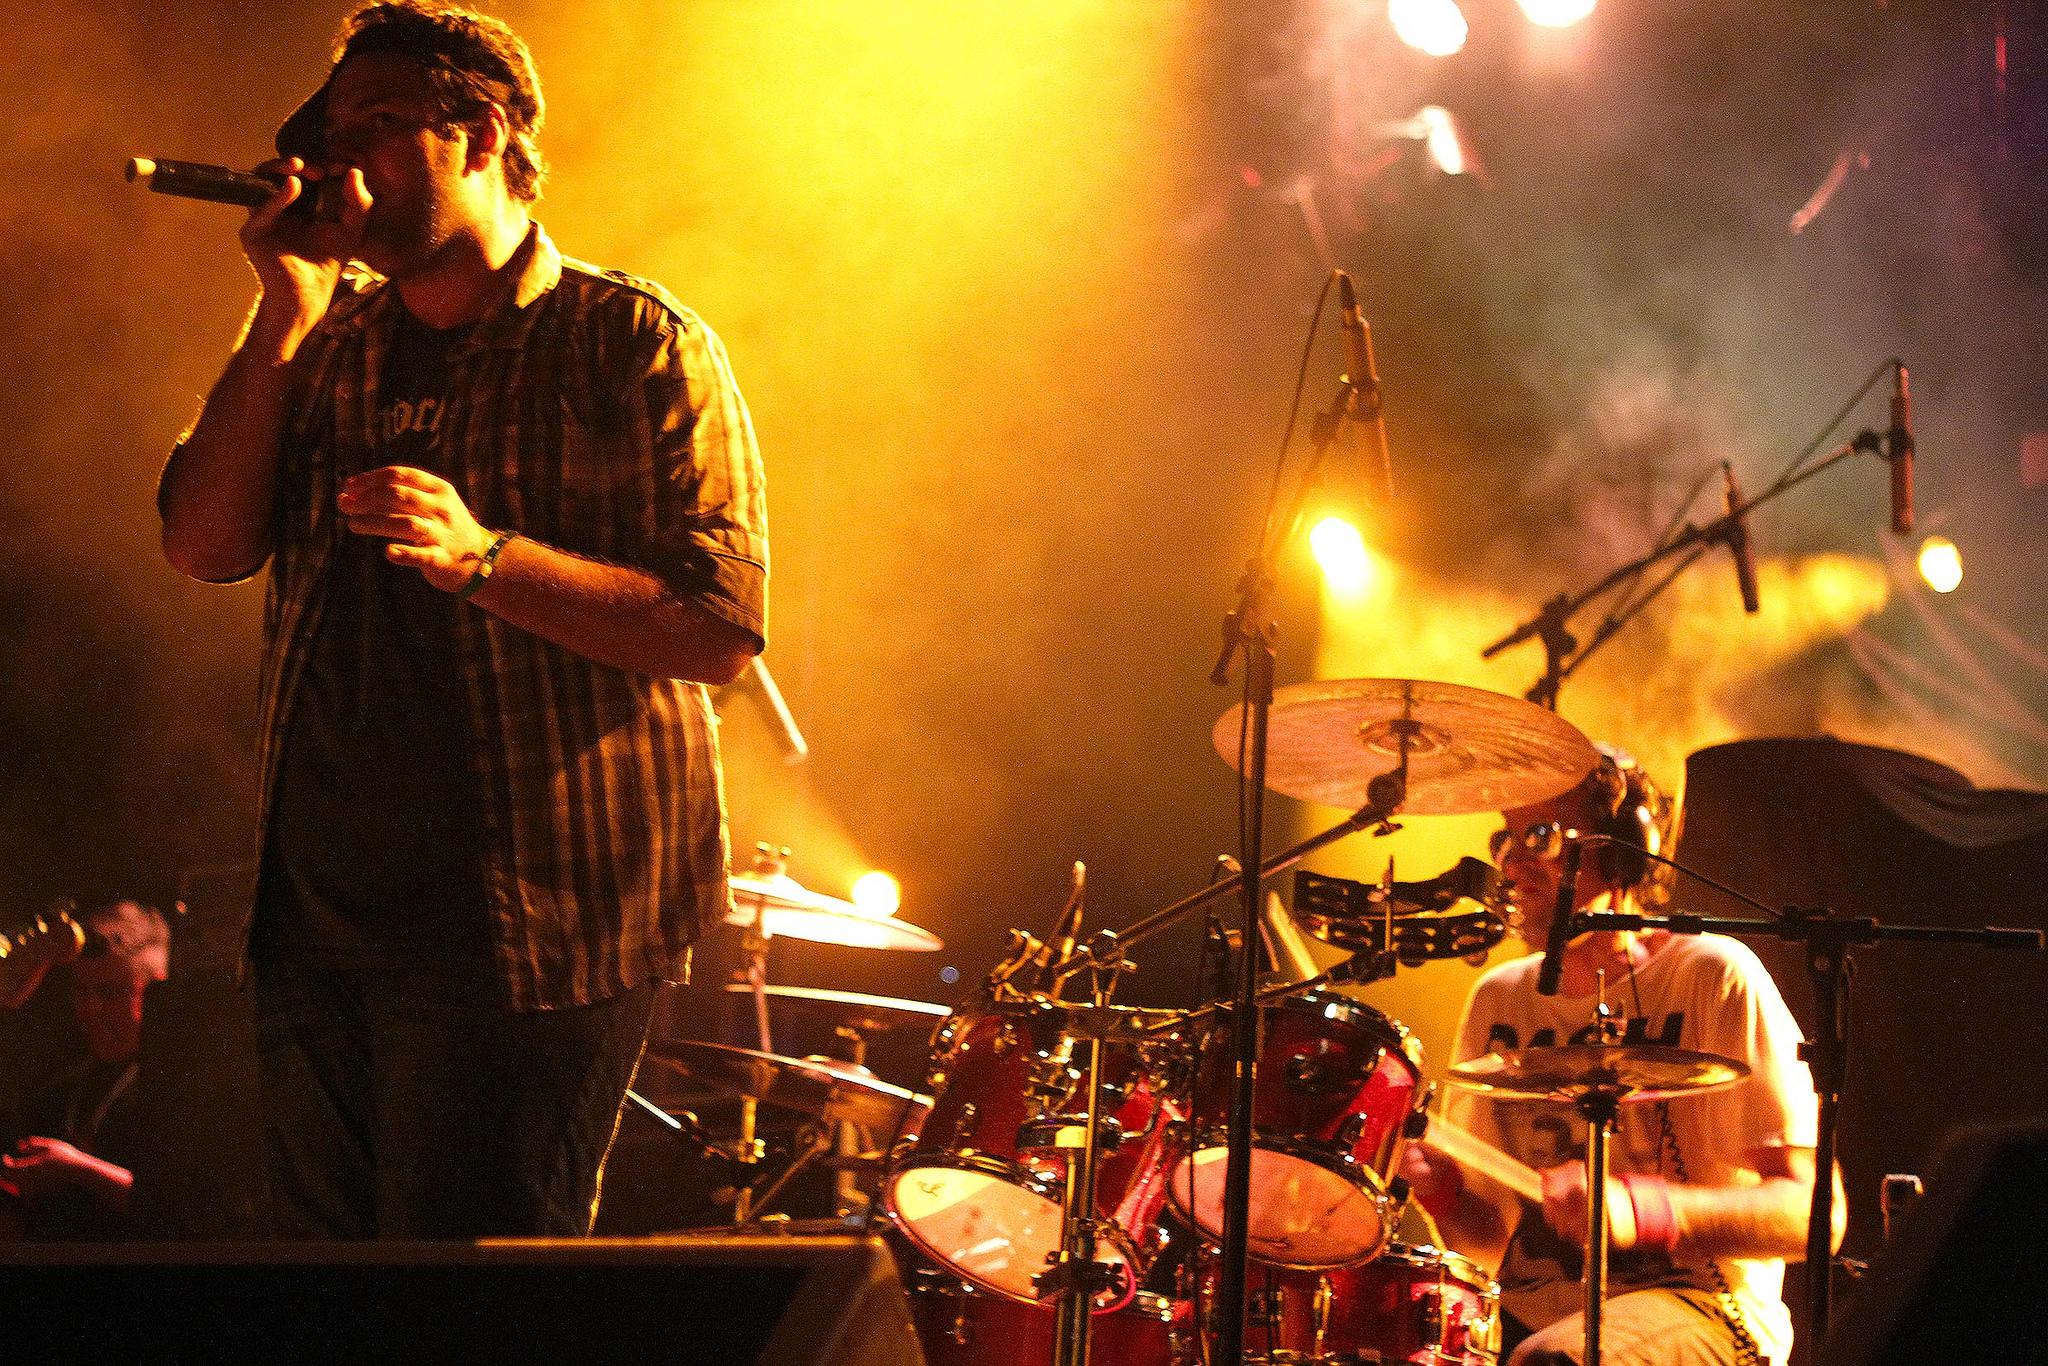 BROWN VICIOS BAIXAR MUSICA E DO JR VIRTUDES CHARLIE